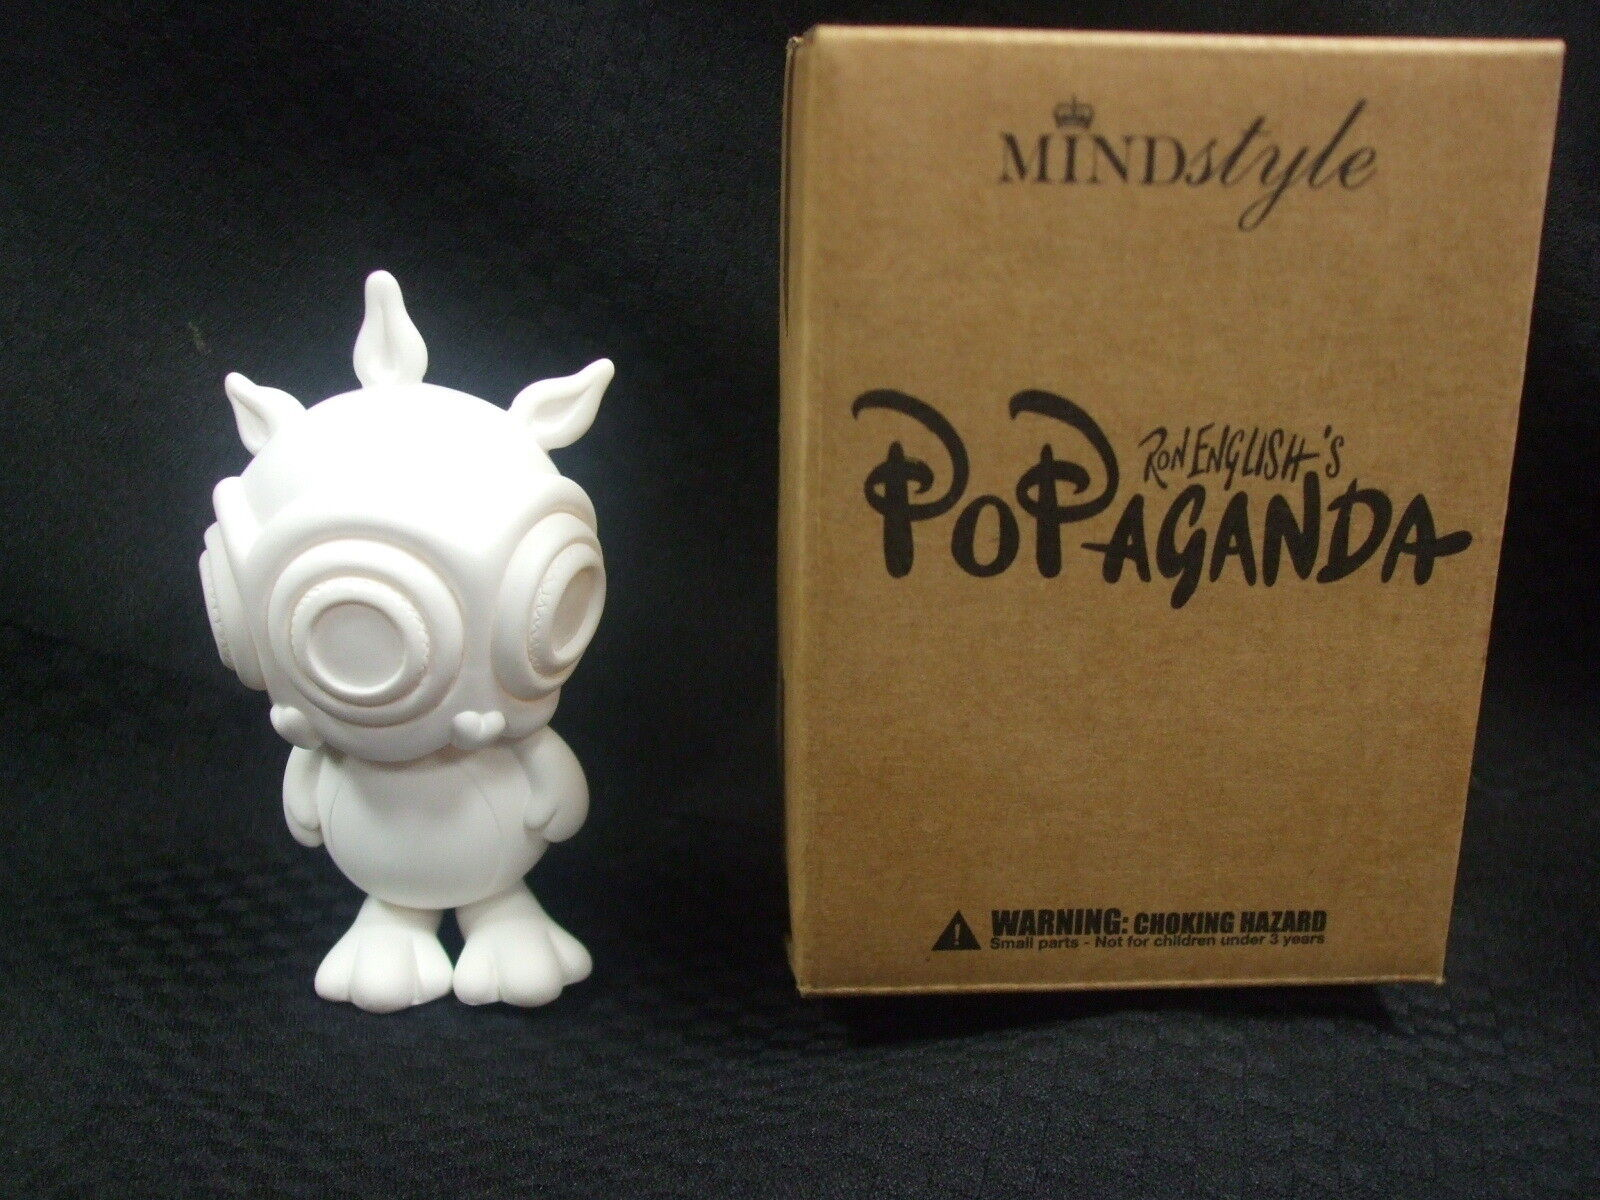 2009 Ron English POPaganda Mini Ronnnie Rabbbit - All Weiß Chase Figure w/ Box